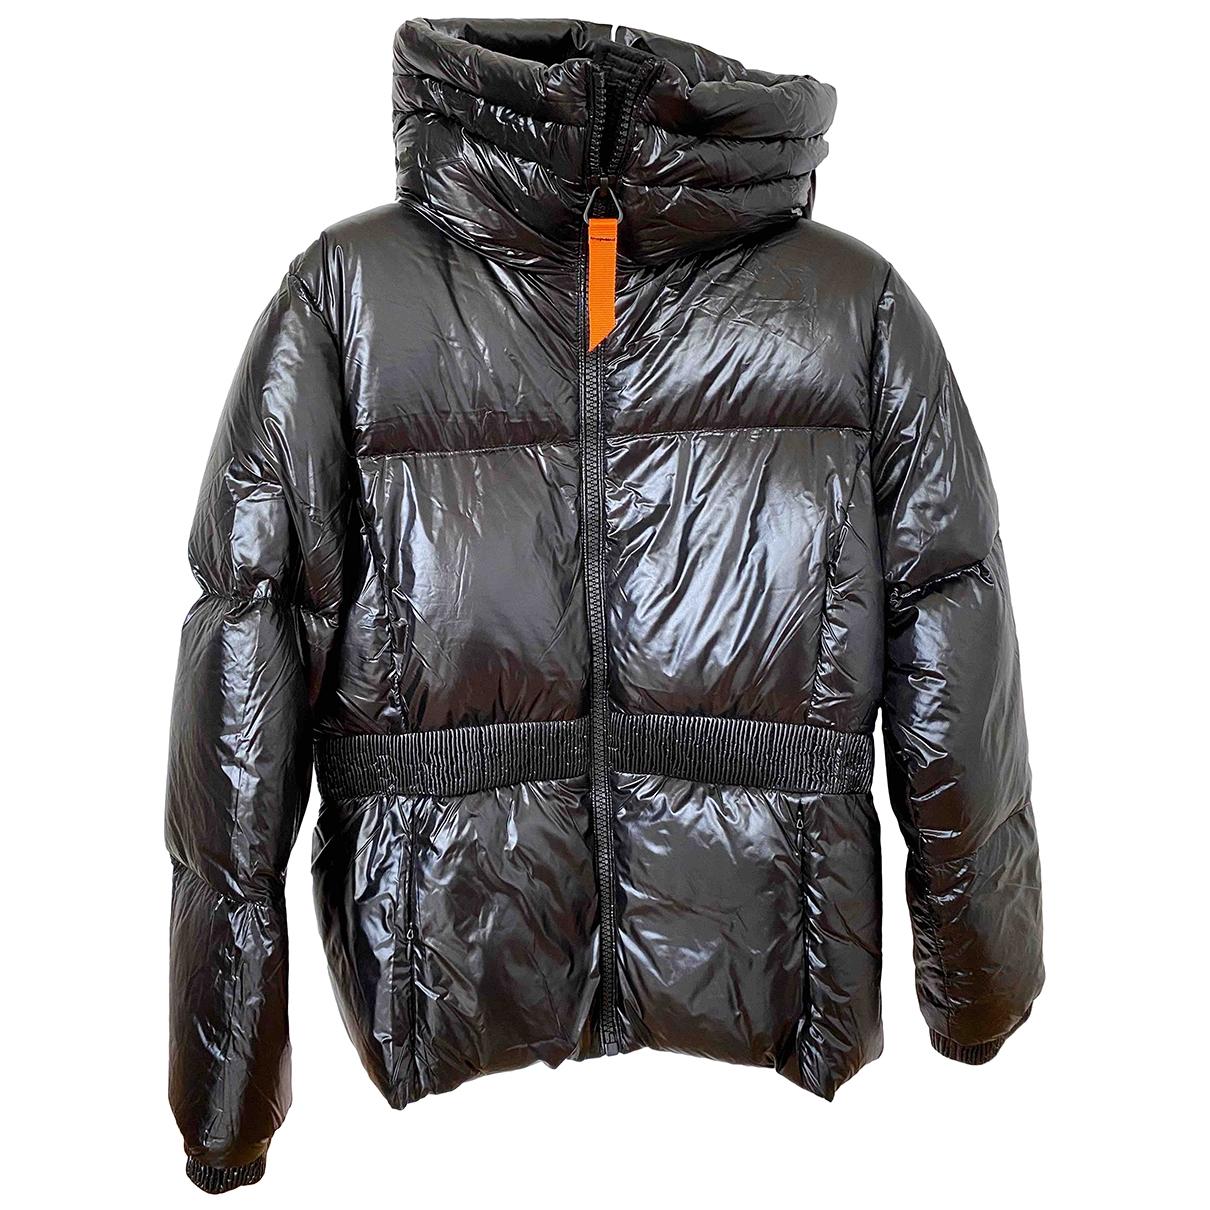 Gertrude+gaston \N Black coat for Women 40 FR